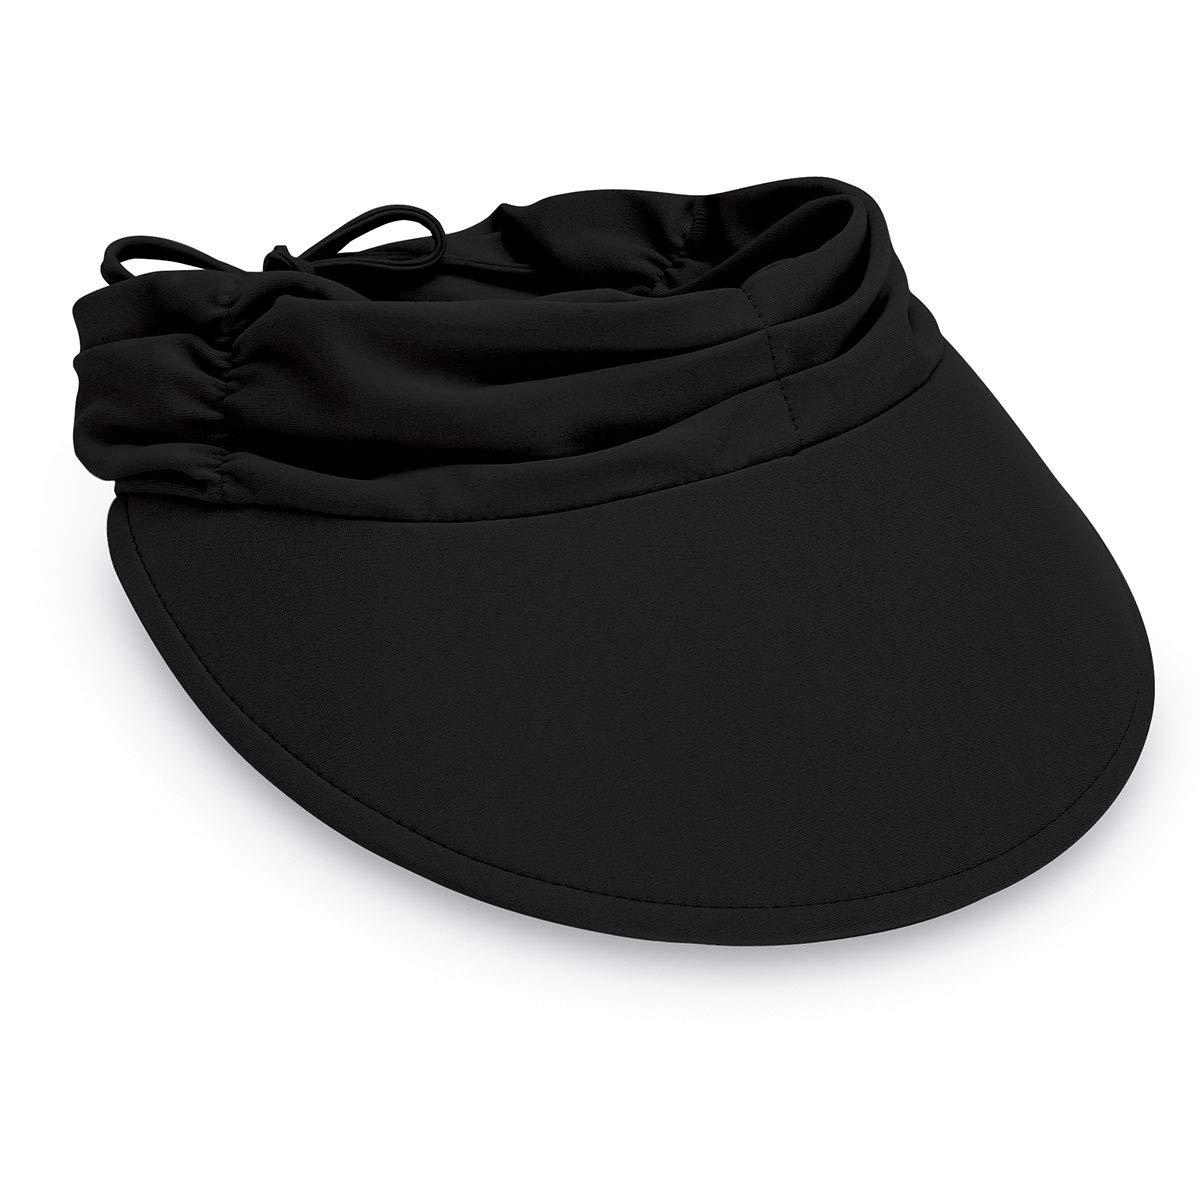 Wallaroo Hat Company Women's Aqua Sun Visor – Ultra-Lightweight Ready for Adventure Designed in Australia